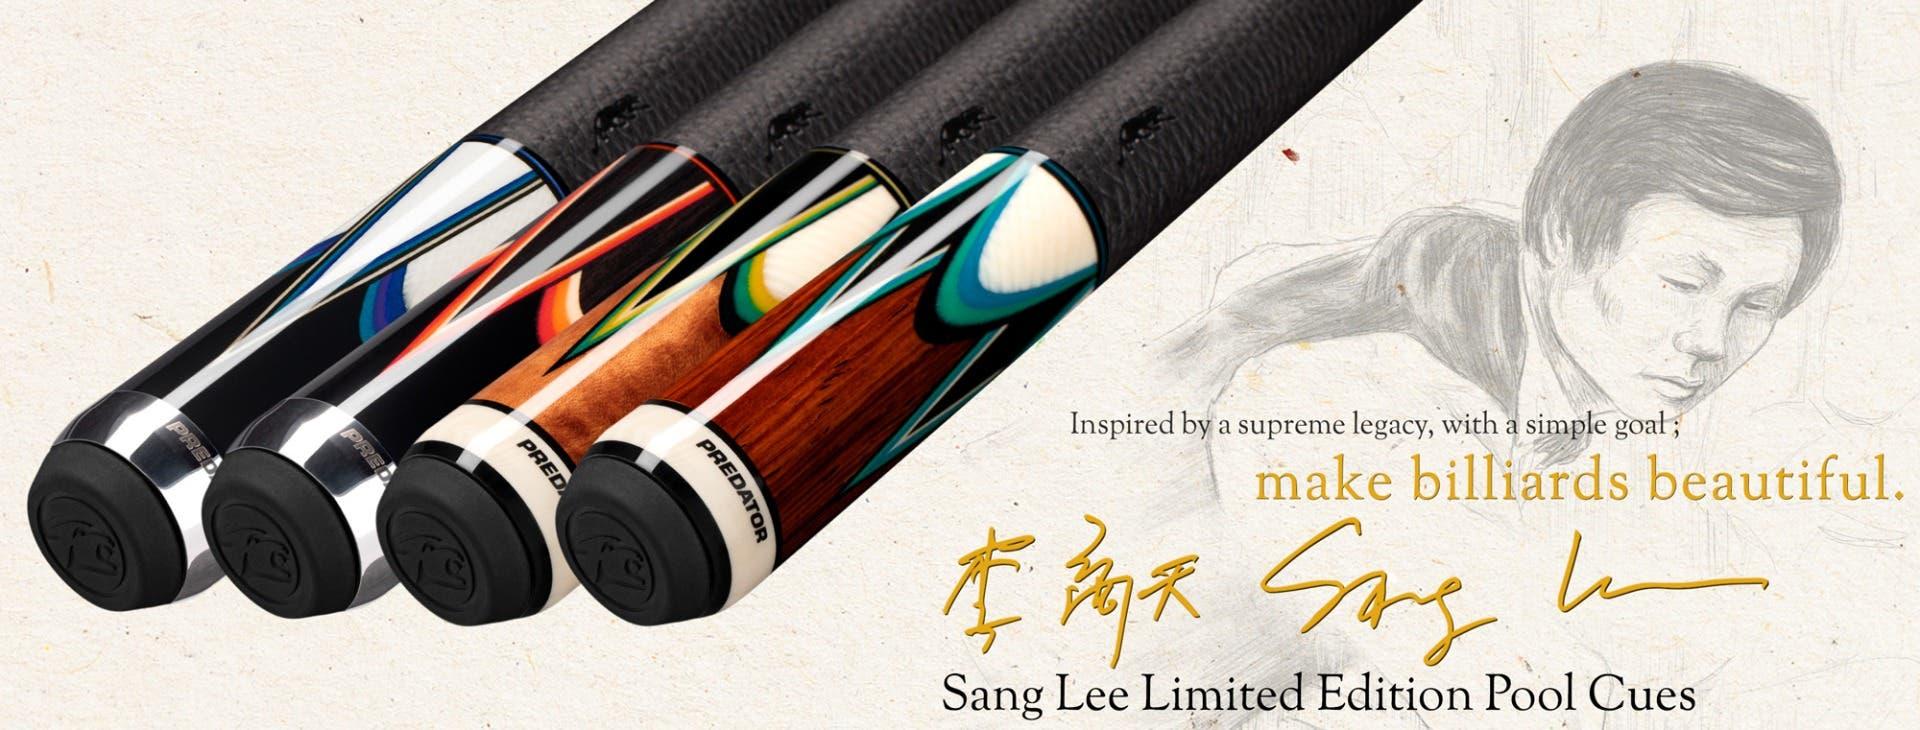 Sang Lee Limited Edition Pool Cues